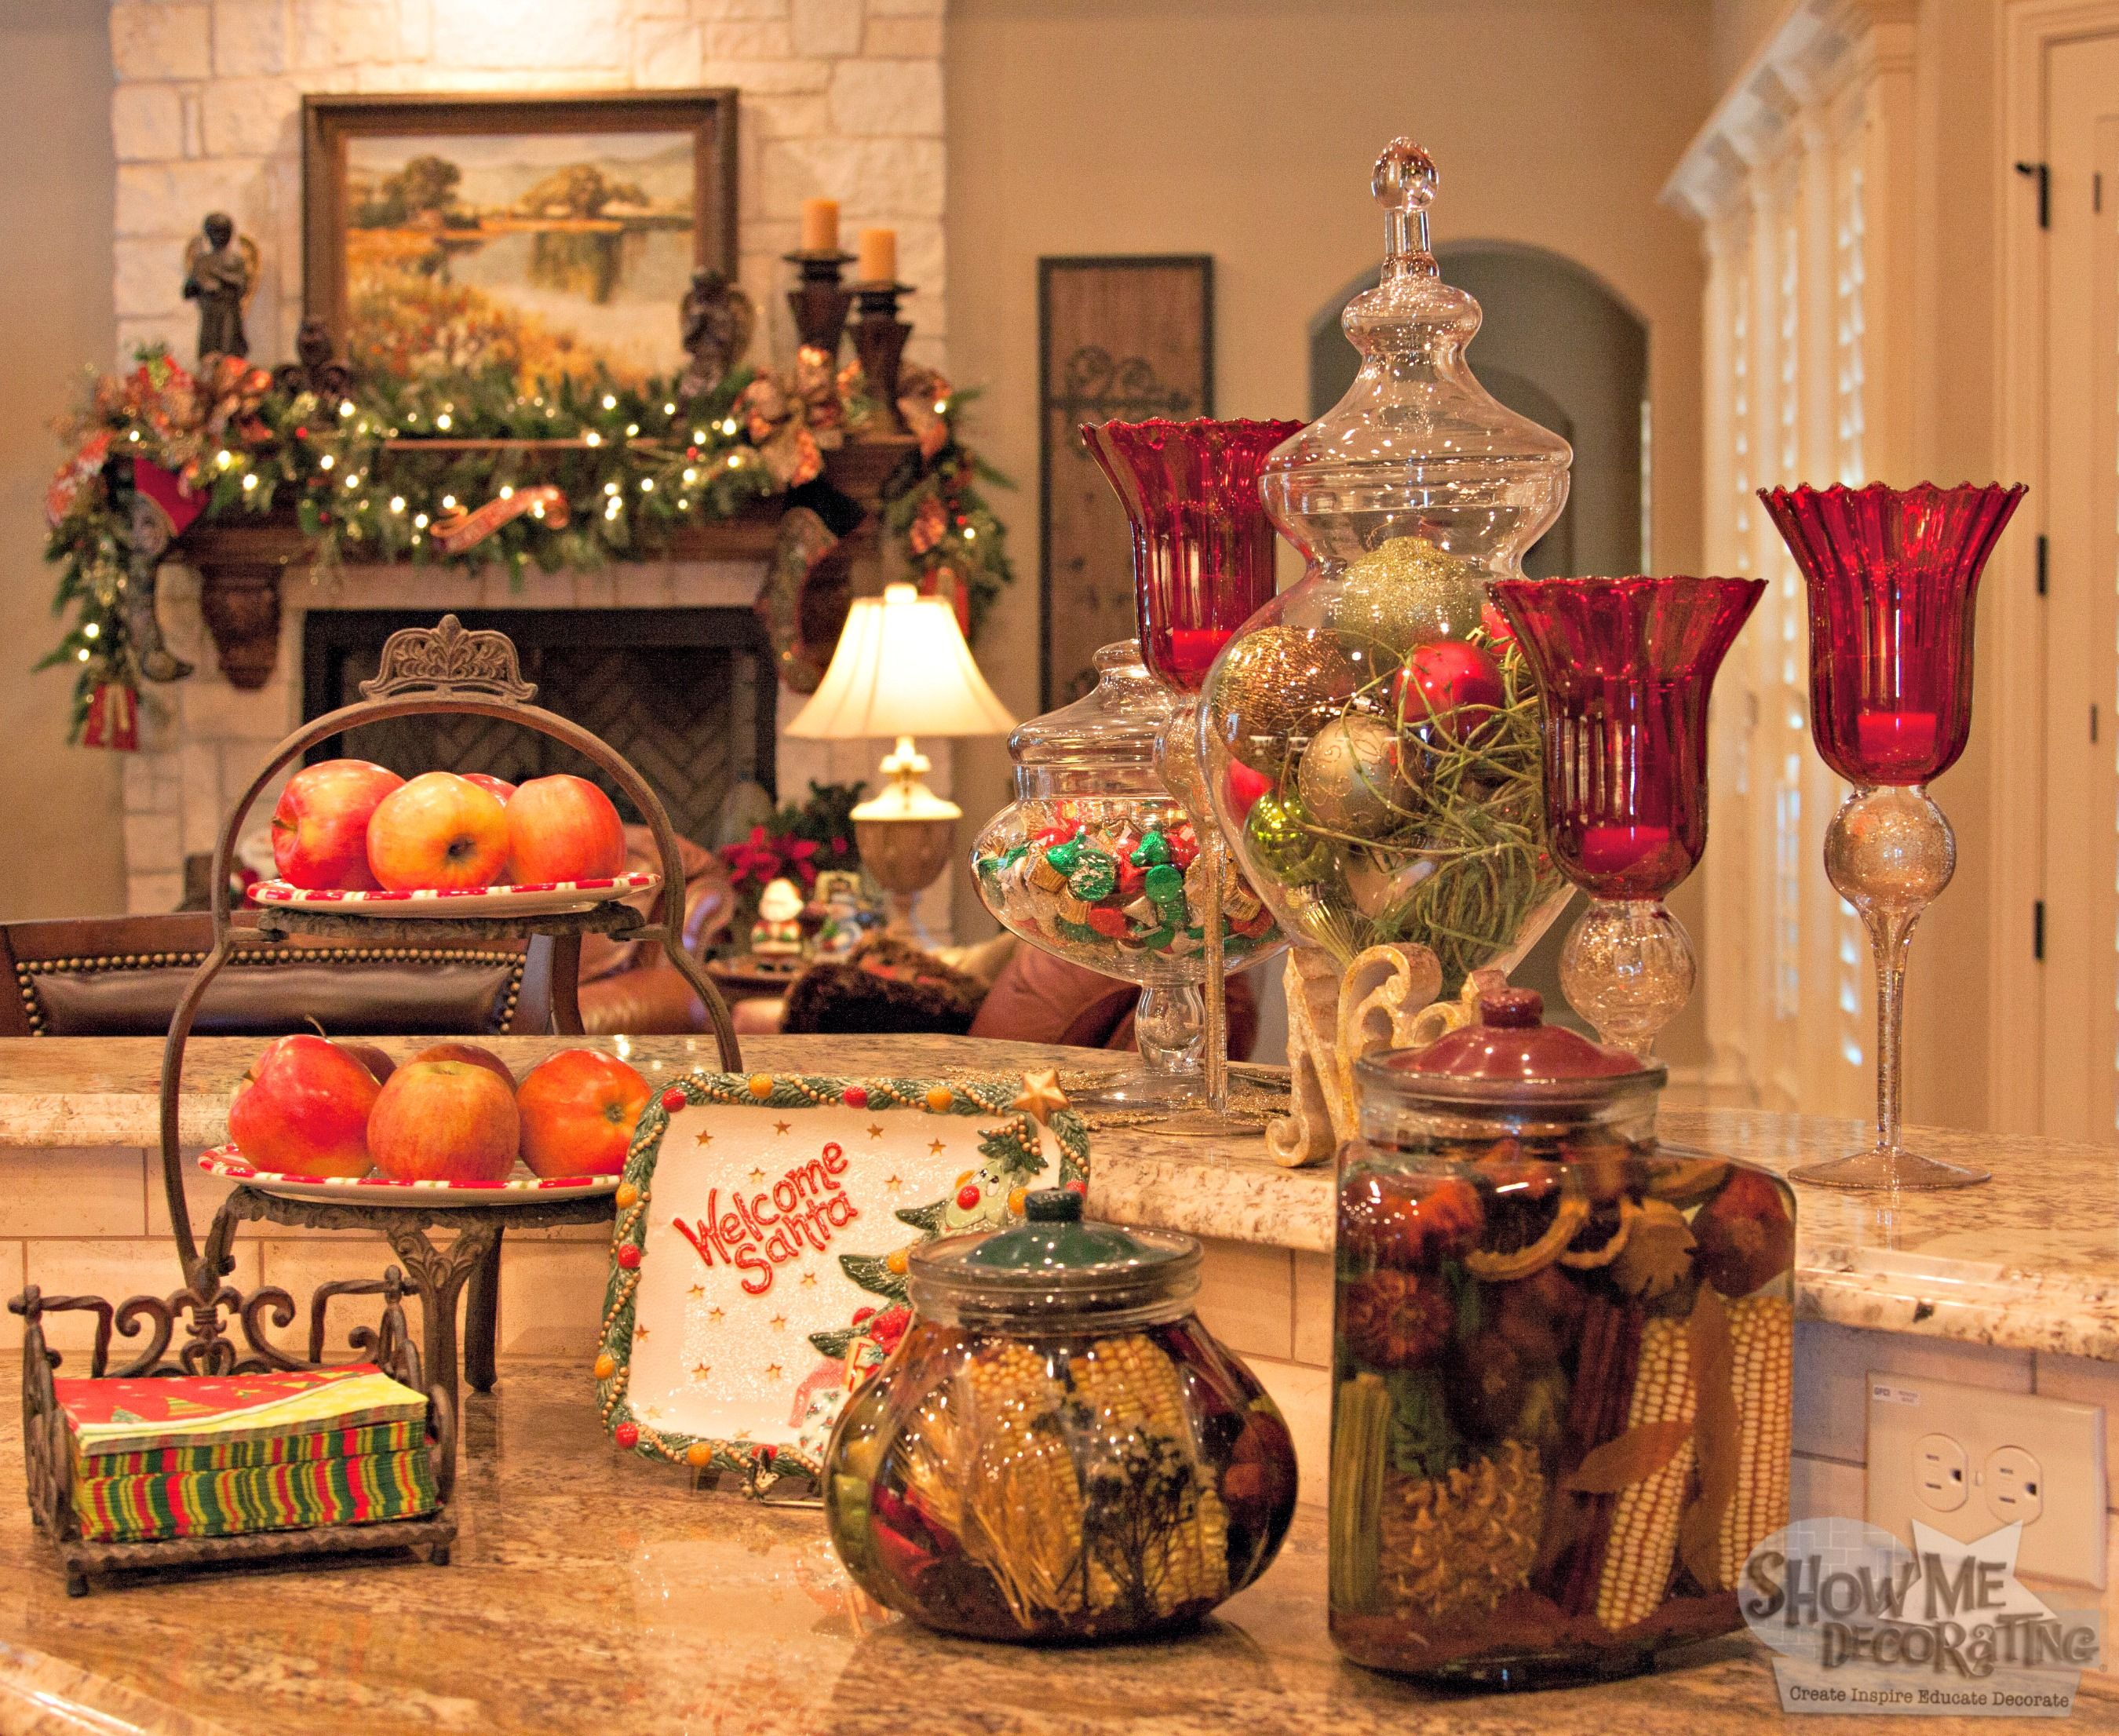 Christmas kitchen decor - Kitchen Christmas Decor Christmas Decorations Red And Green Dark Wood Floor Kitchen Ideas White